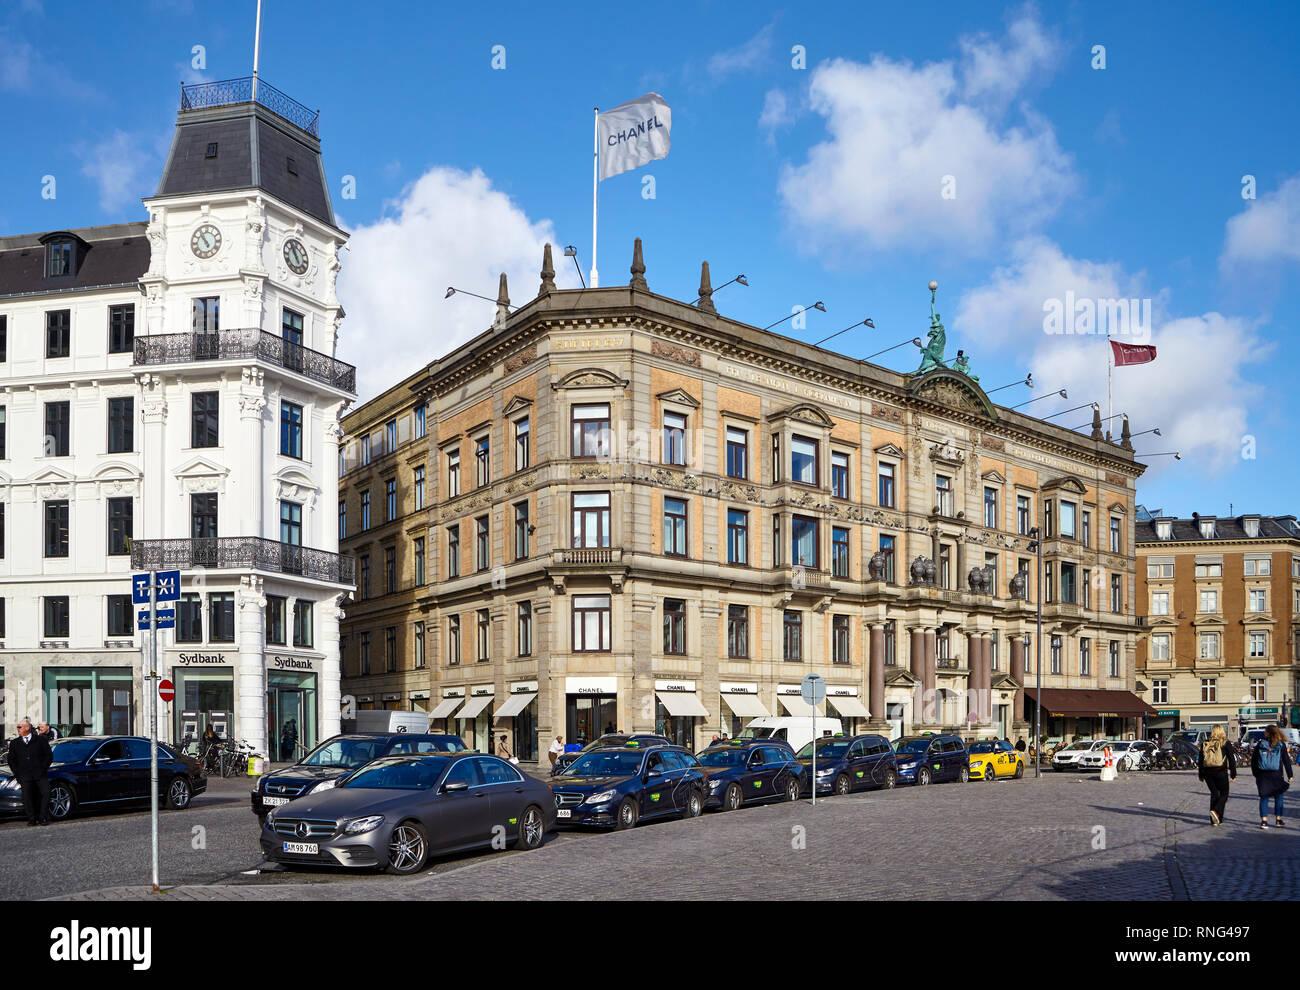 Copenhagen, Denmark - October 22, 2018: Taxi stand in front of CHANEL store at Kongens Nytorv street. - Stock Image